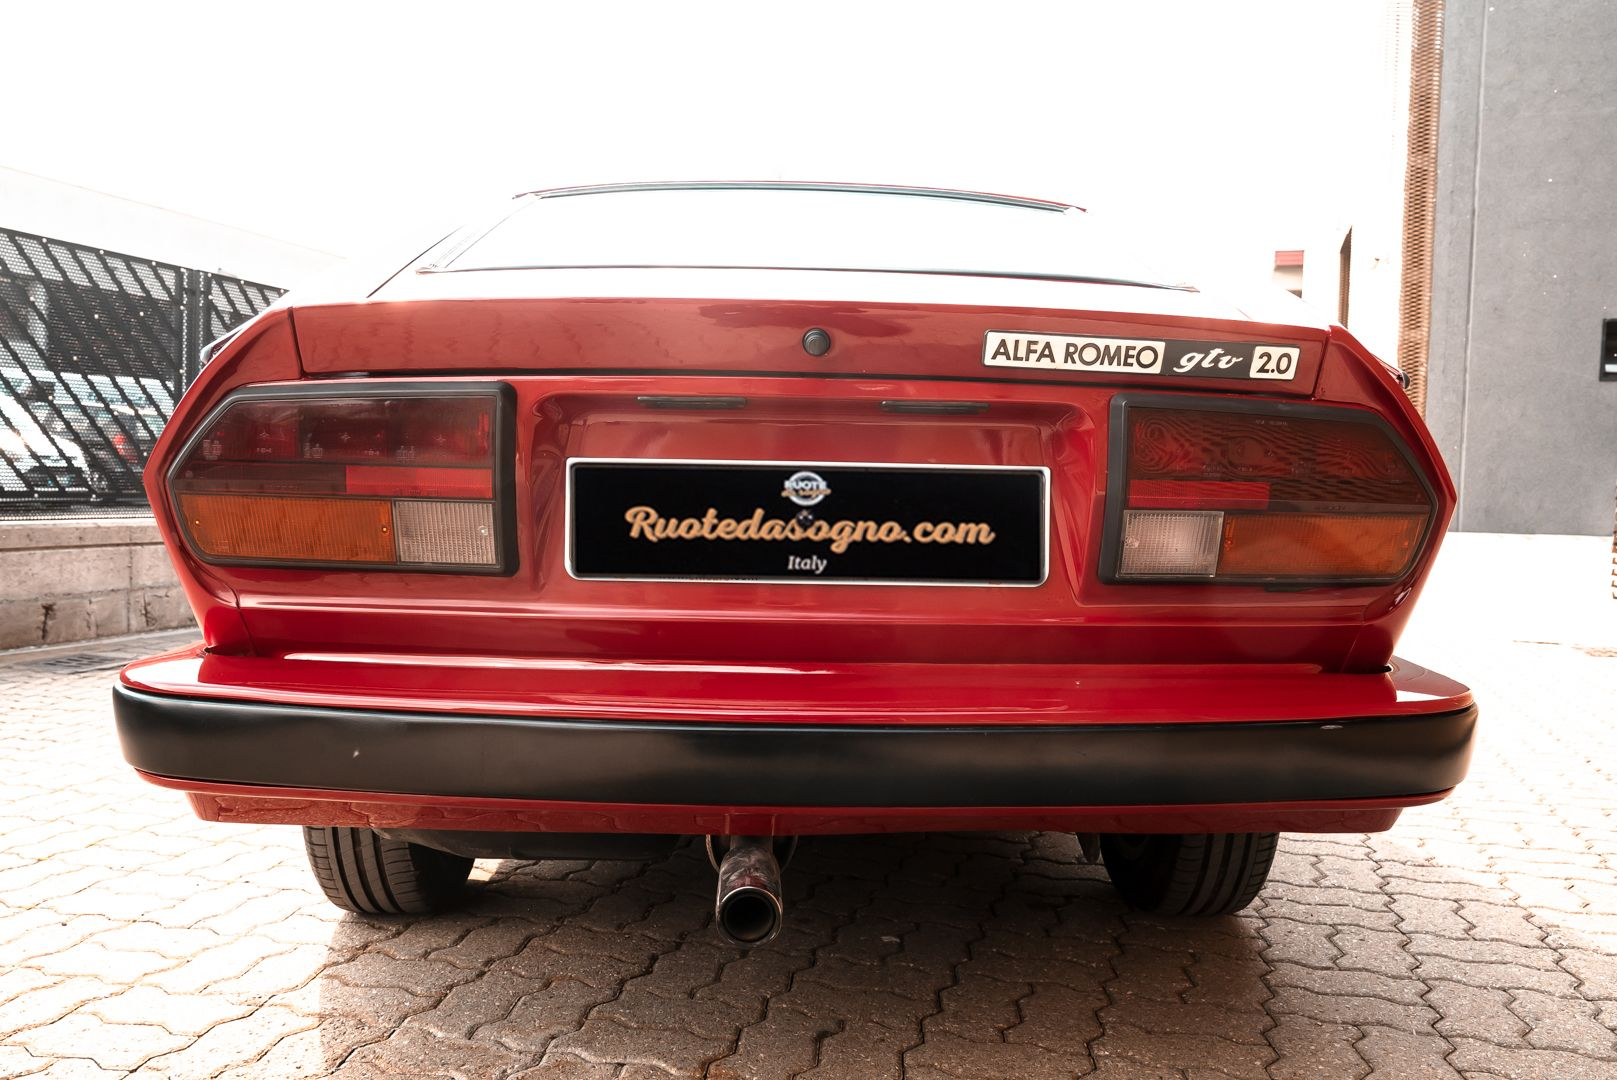 1981 Alfa Romeo Alfetta GTV Gran Prix no. 128 68561